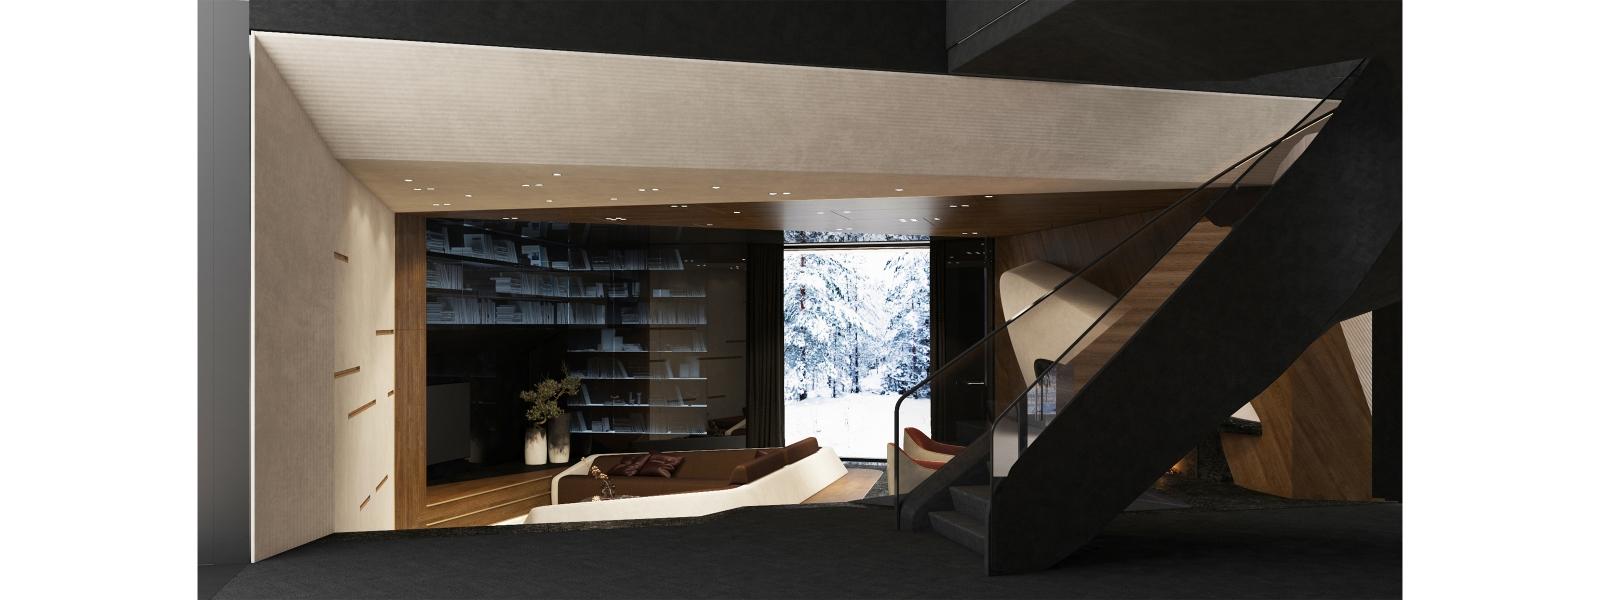 work-Интерьер индивидуального жилого дома «Villa Prizmatiq»